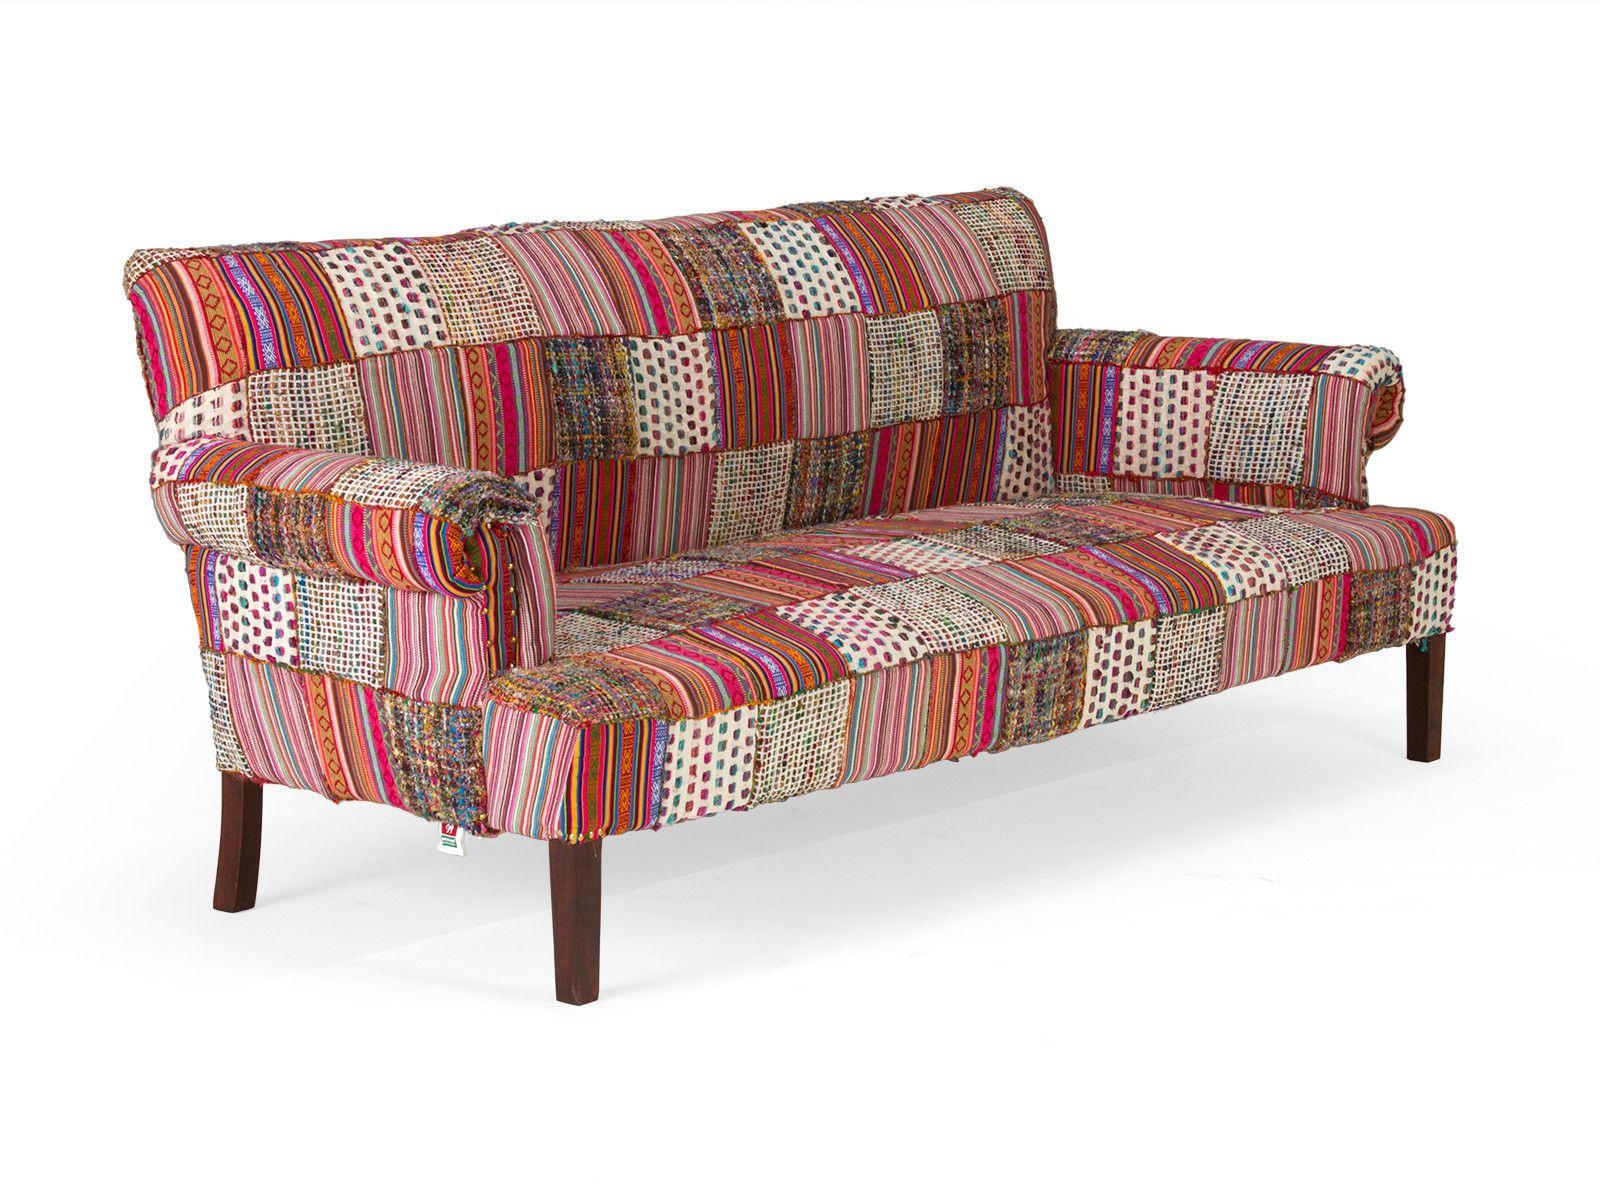 Patchwork Sofa Florese 3 Sitzer Von Massivum De 3 Sitzer Sofa